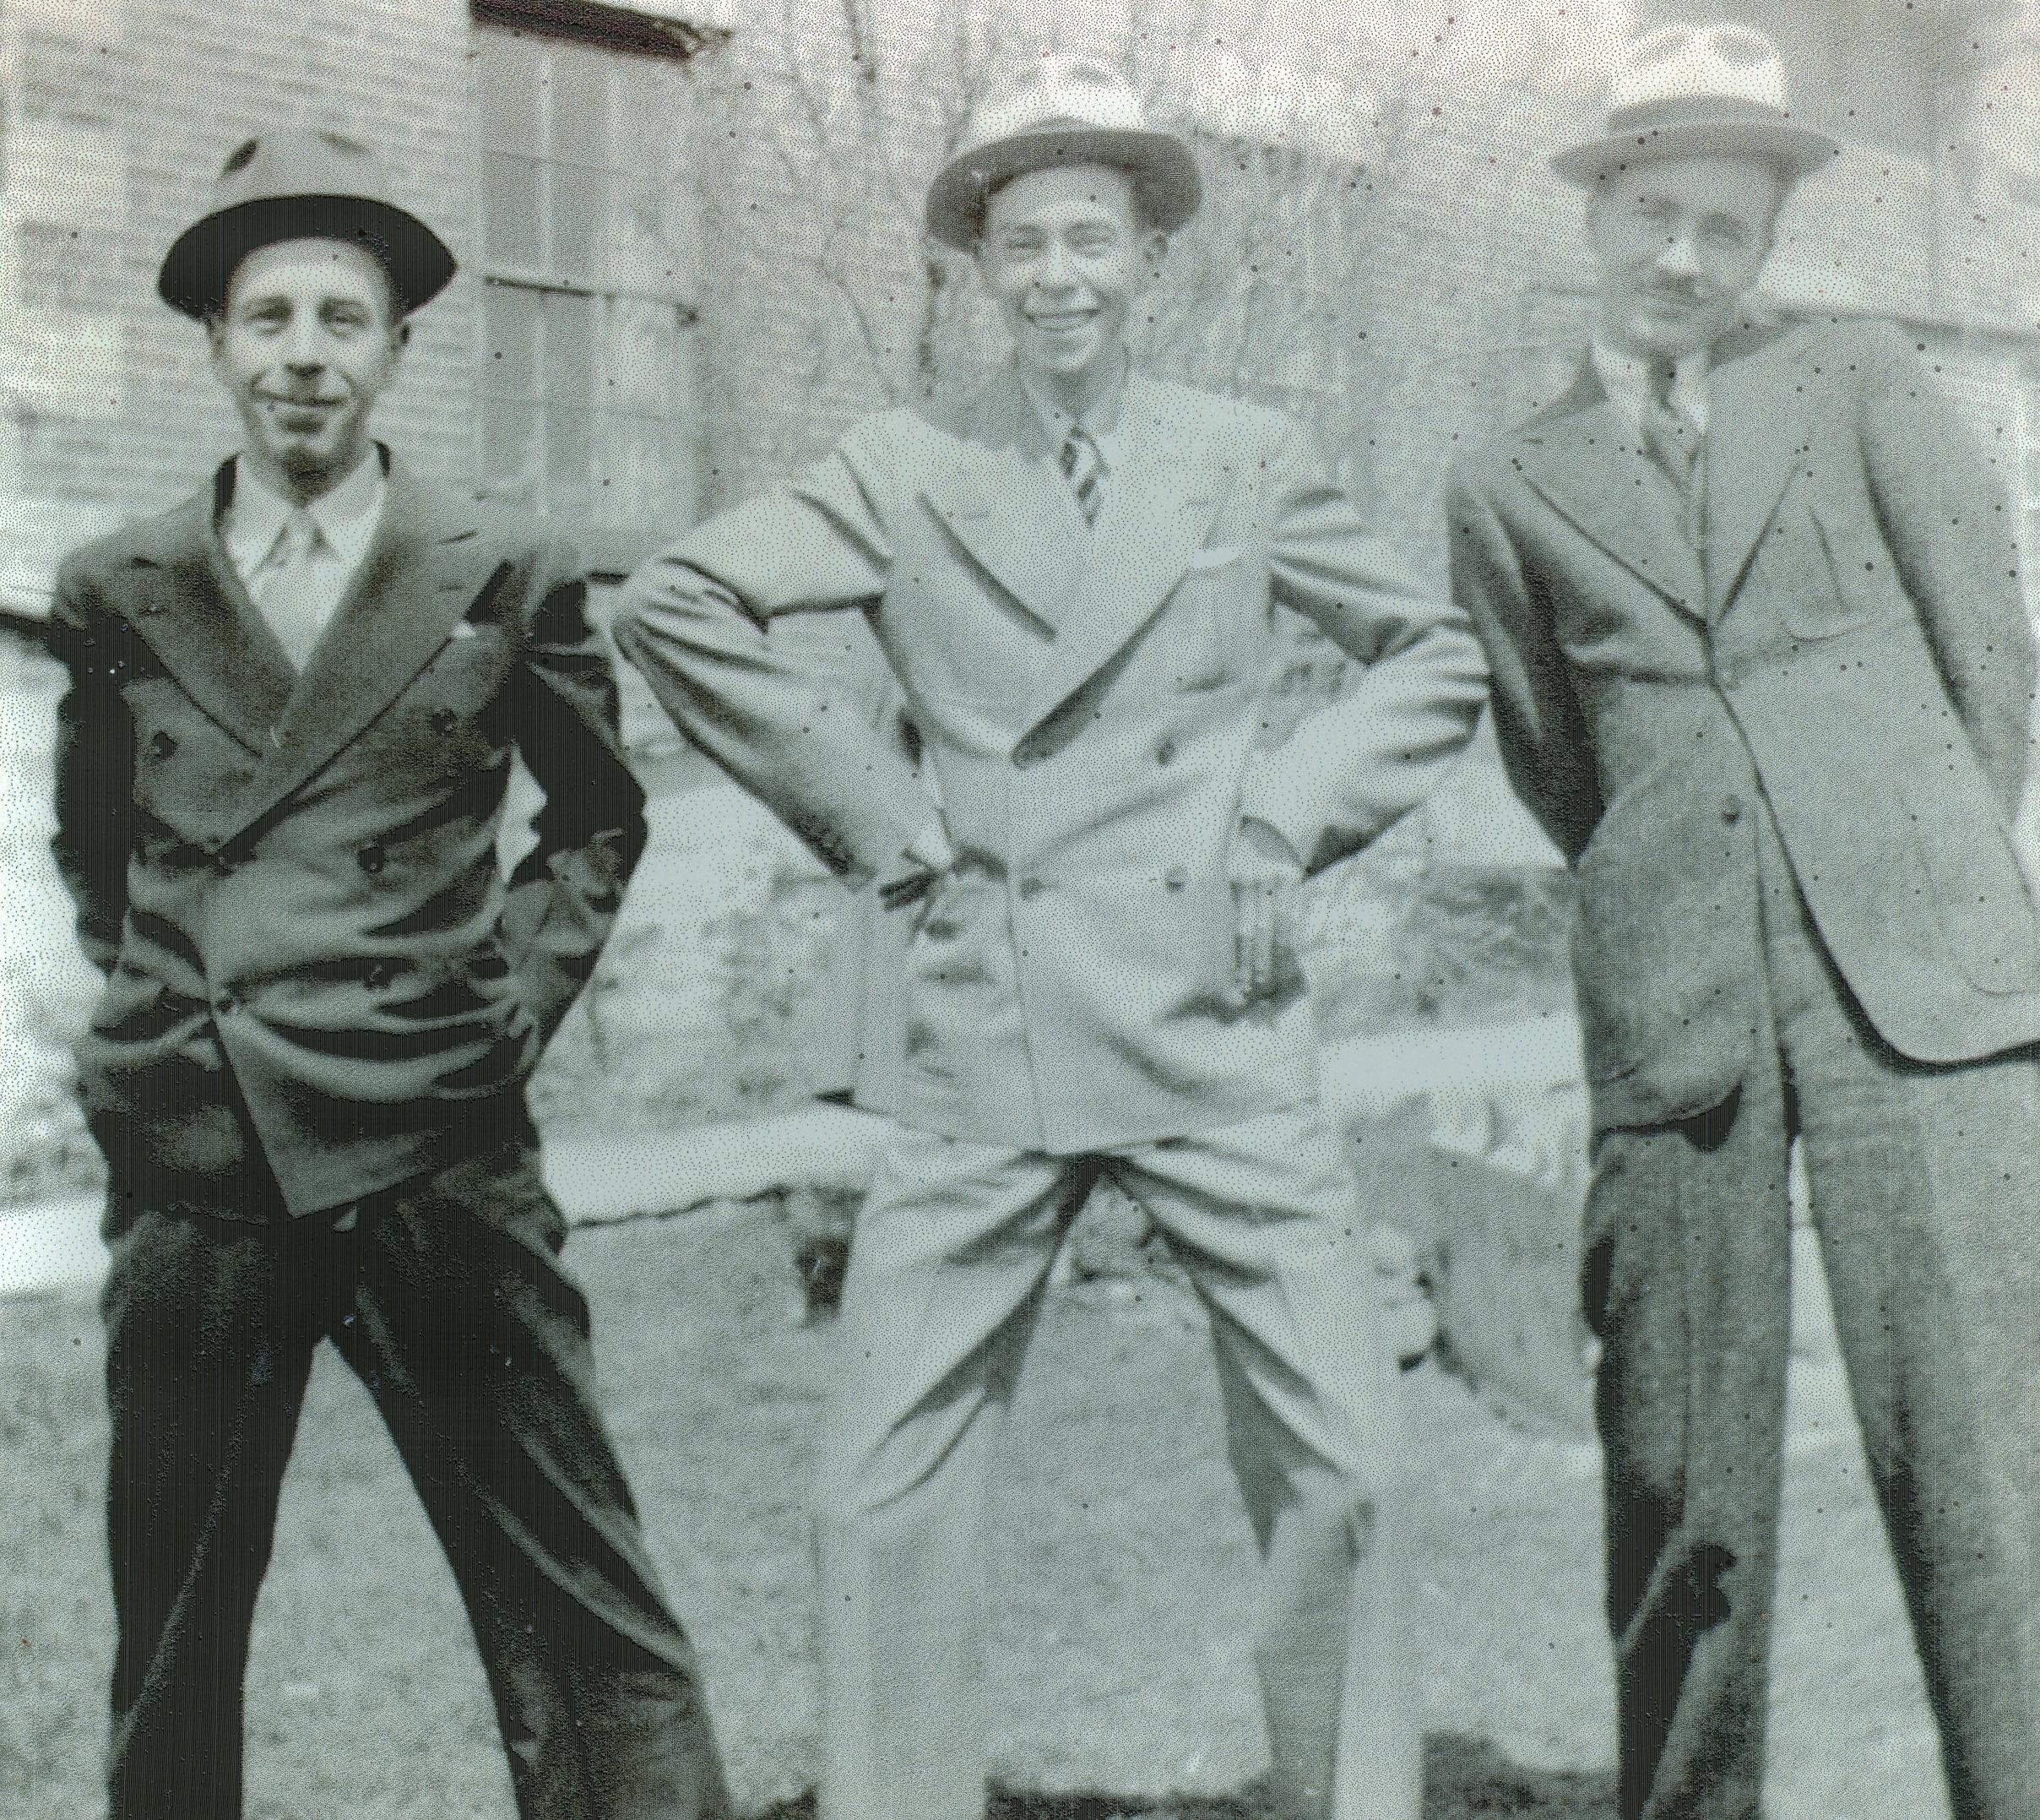 Marett, Don, Jim, Doug 1932